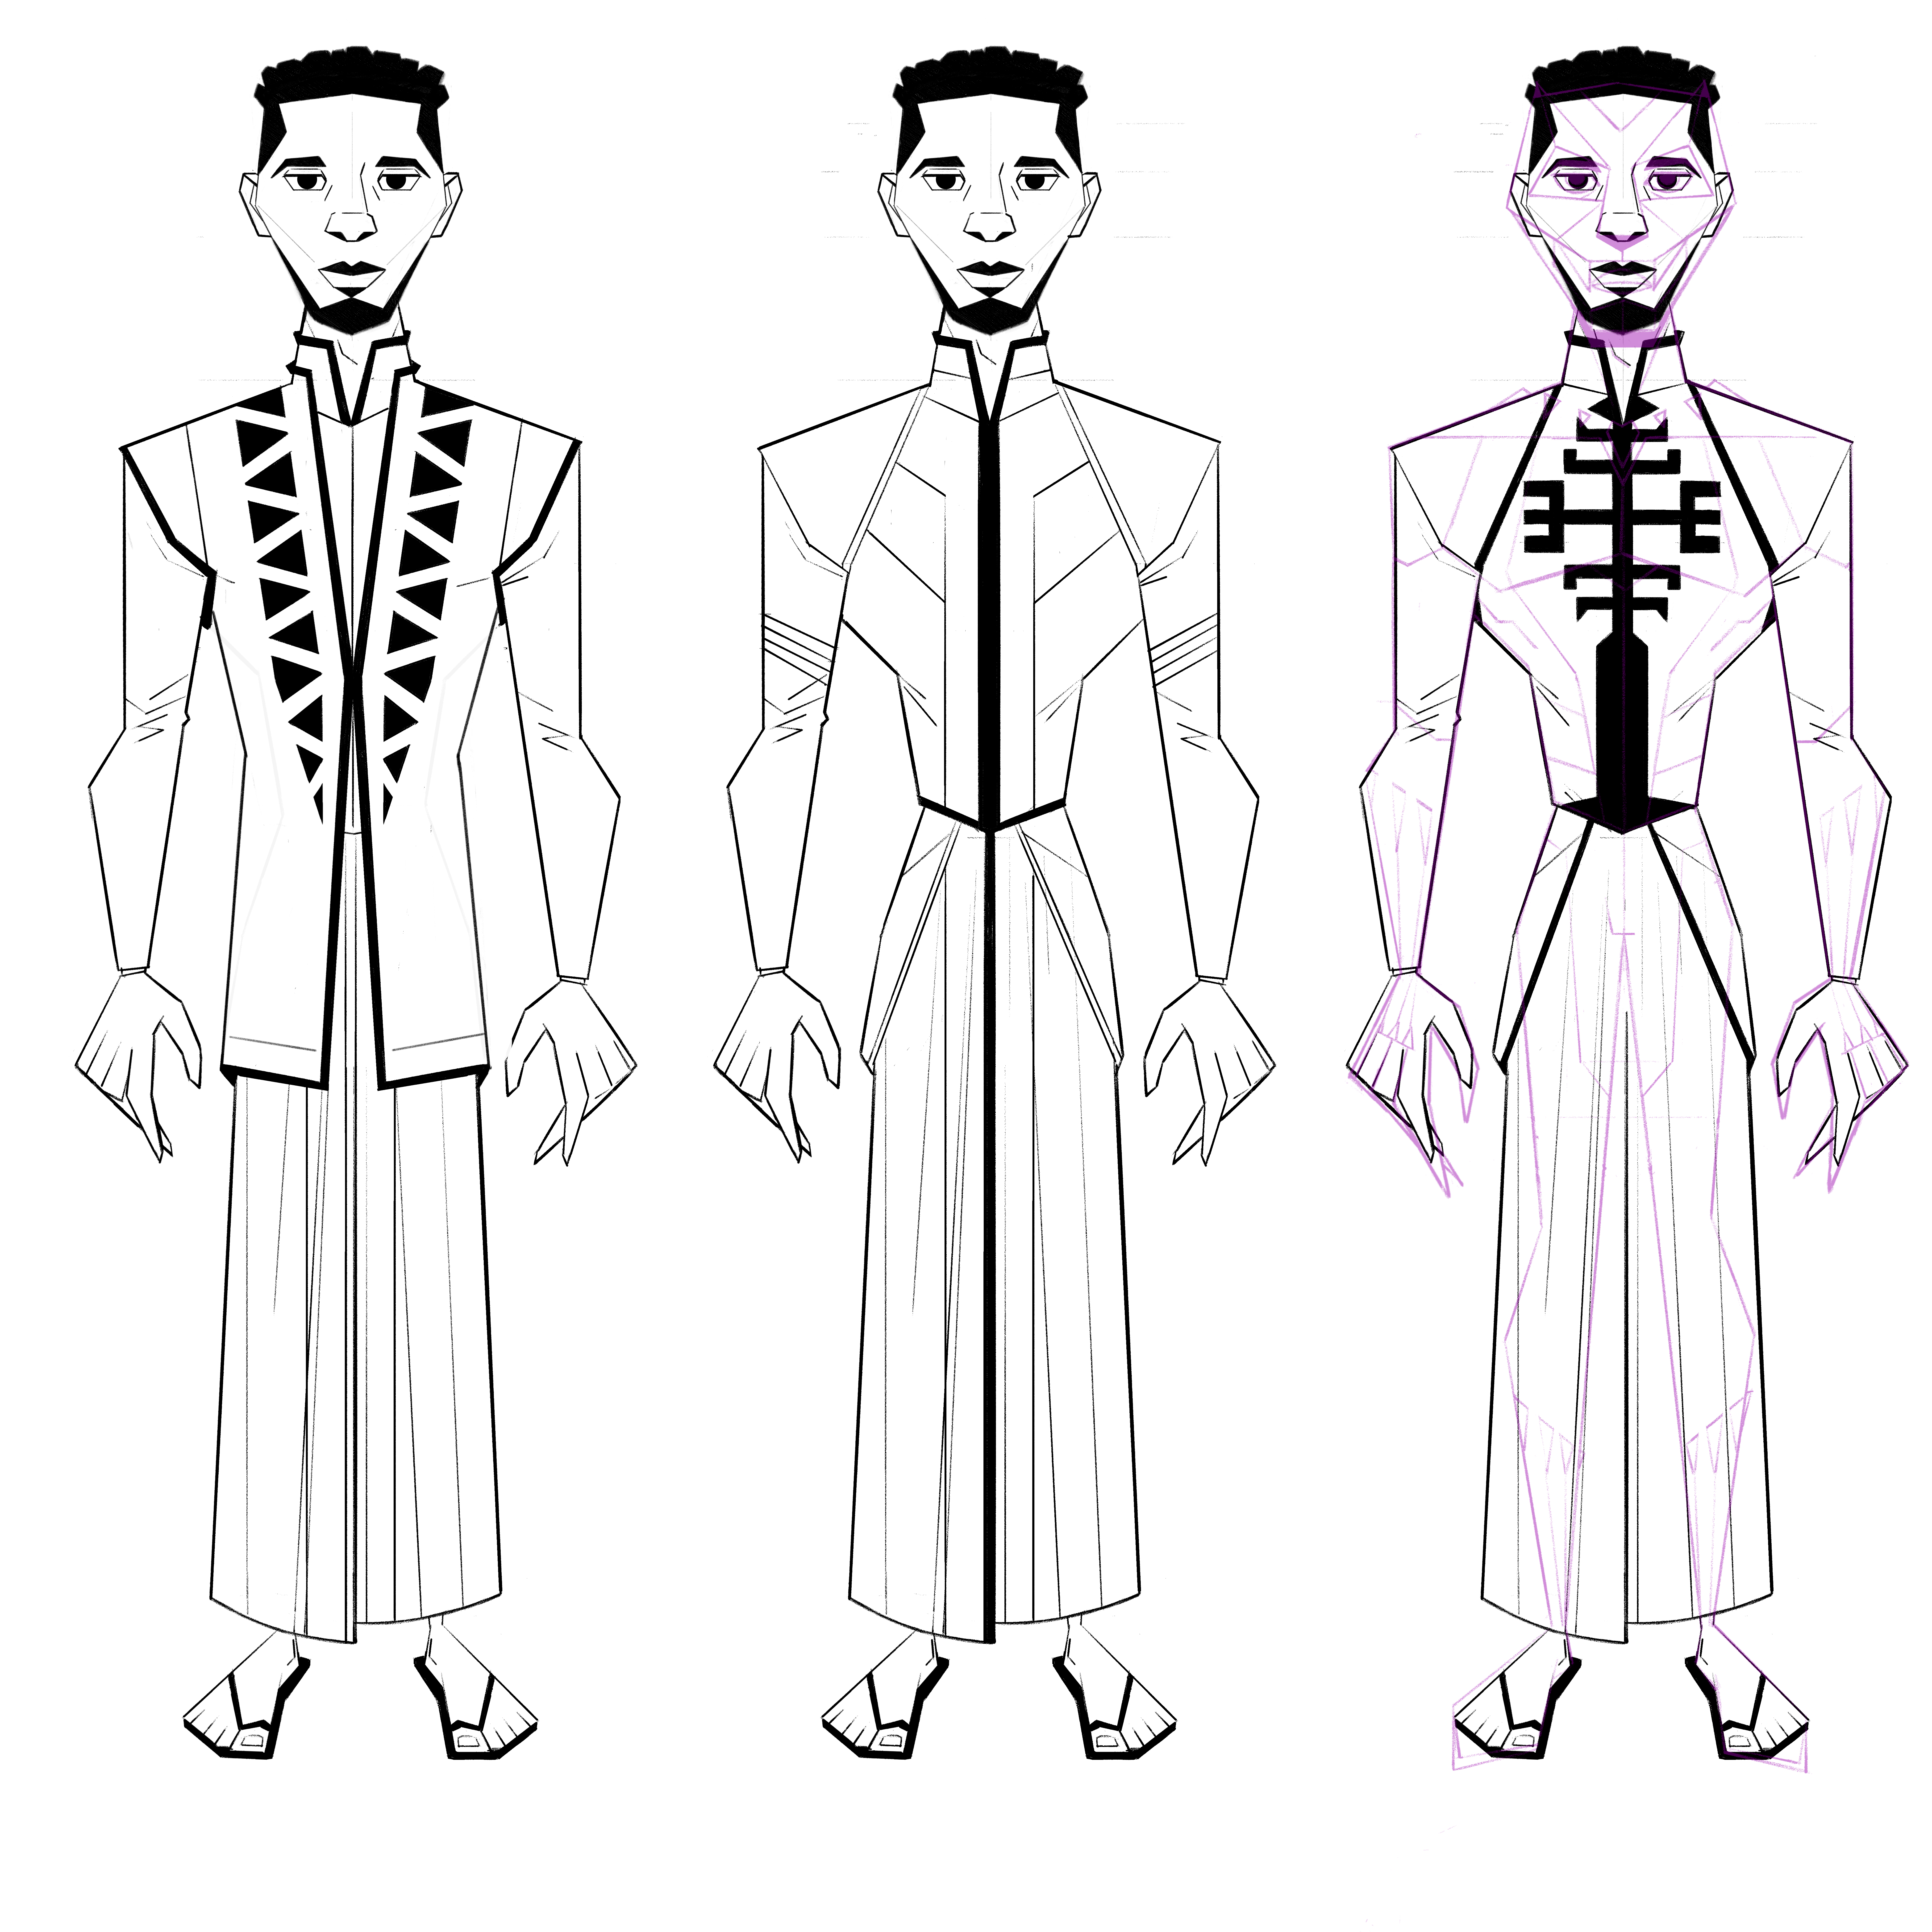 Costume design adjustments updated